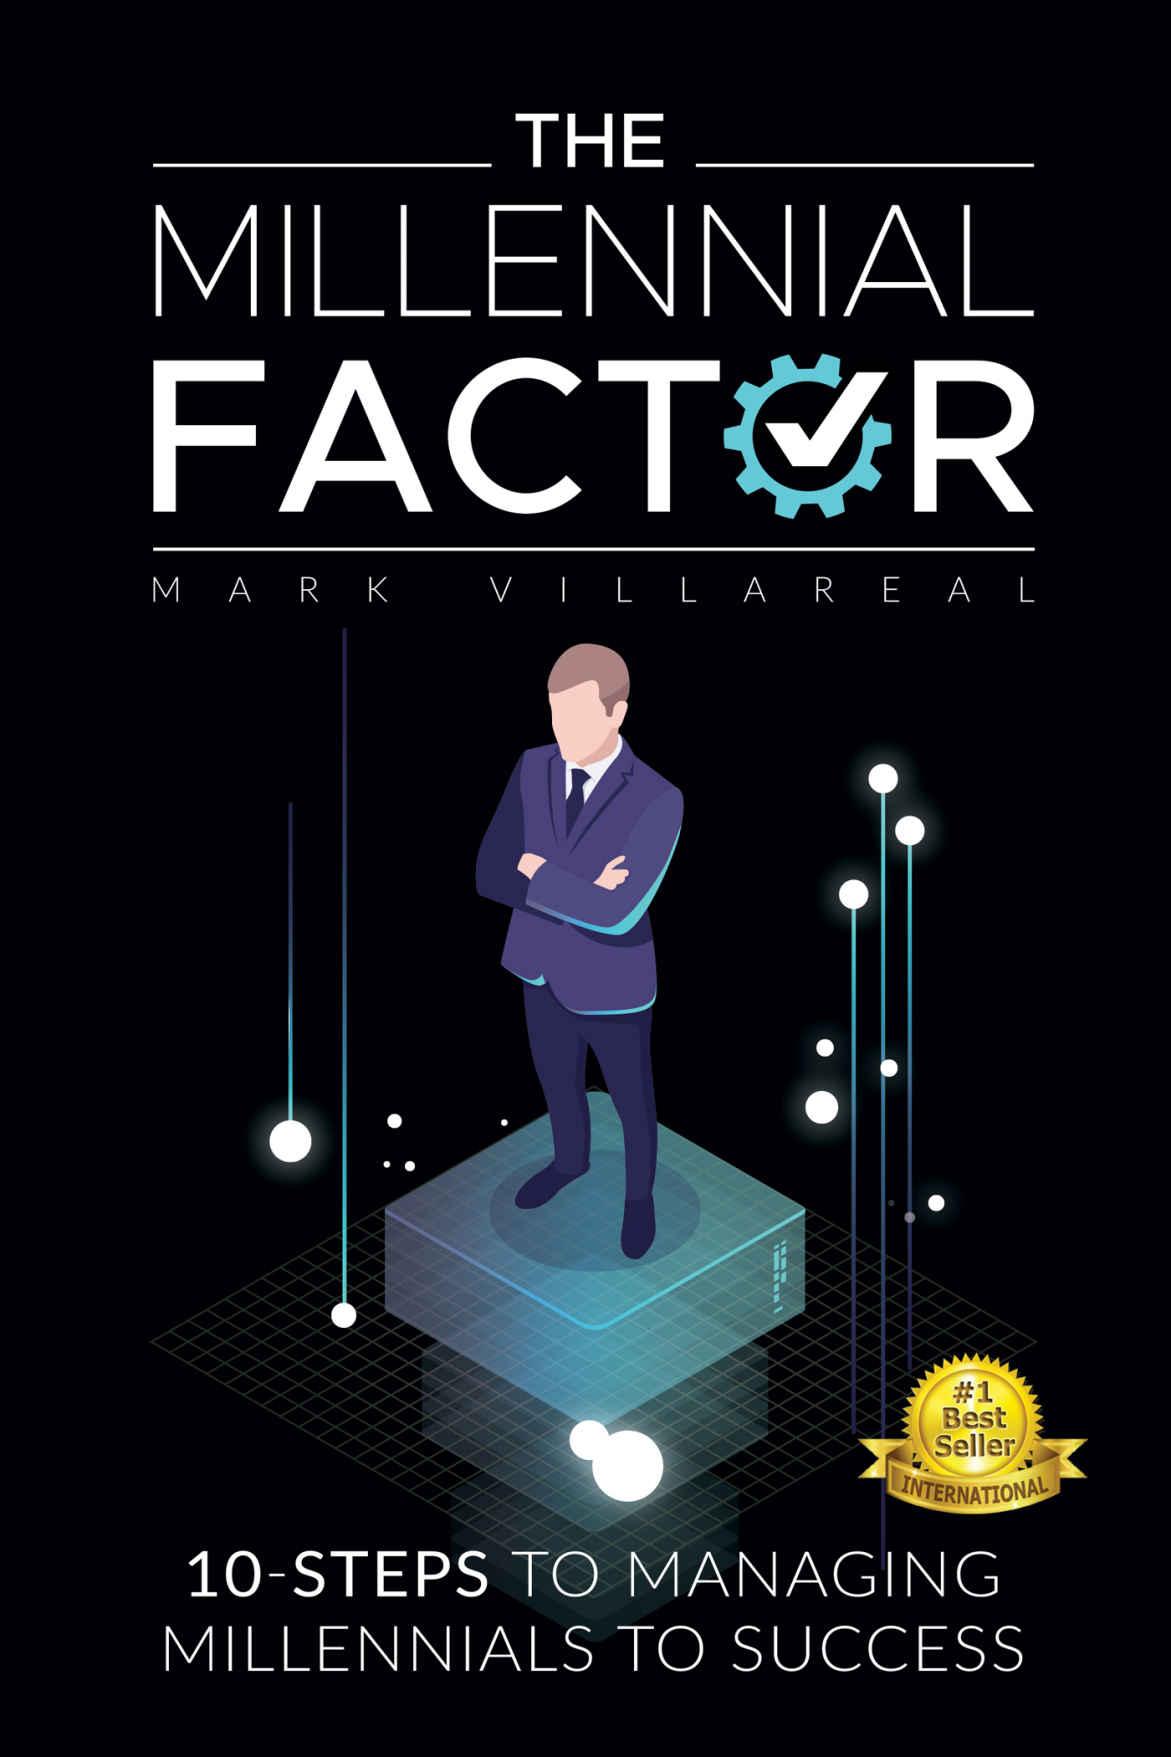 the millenial factor